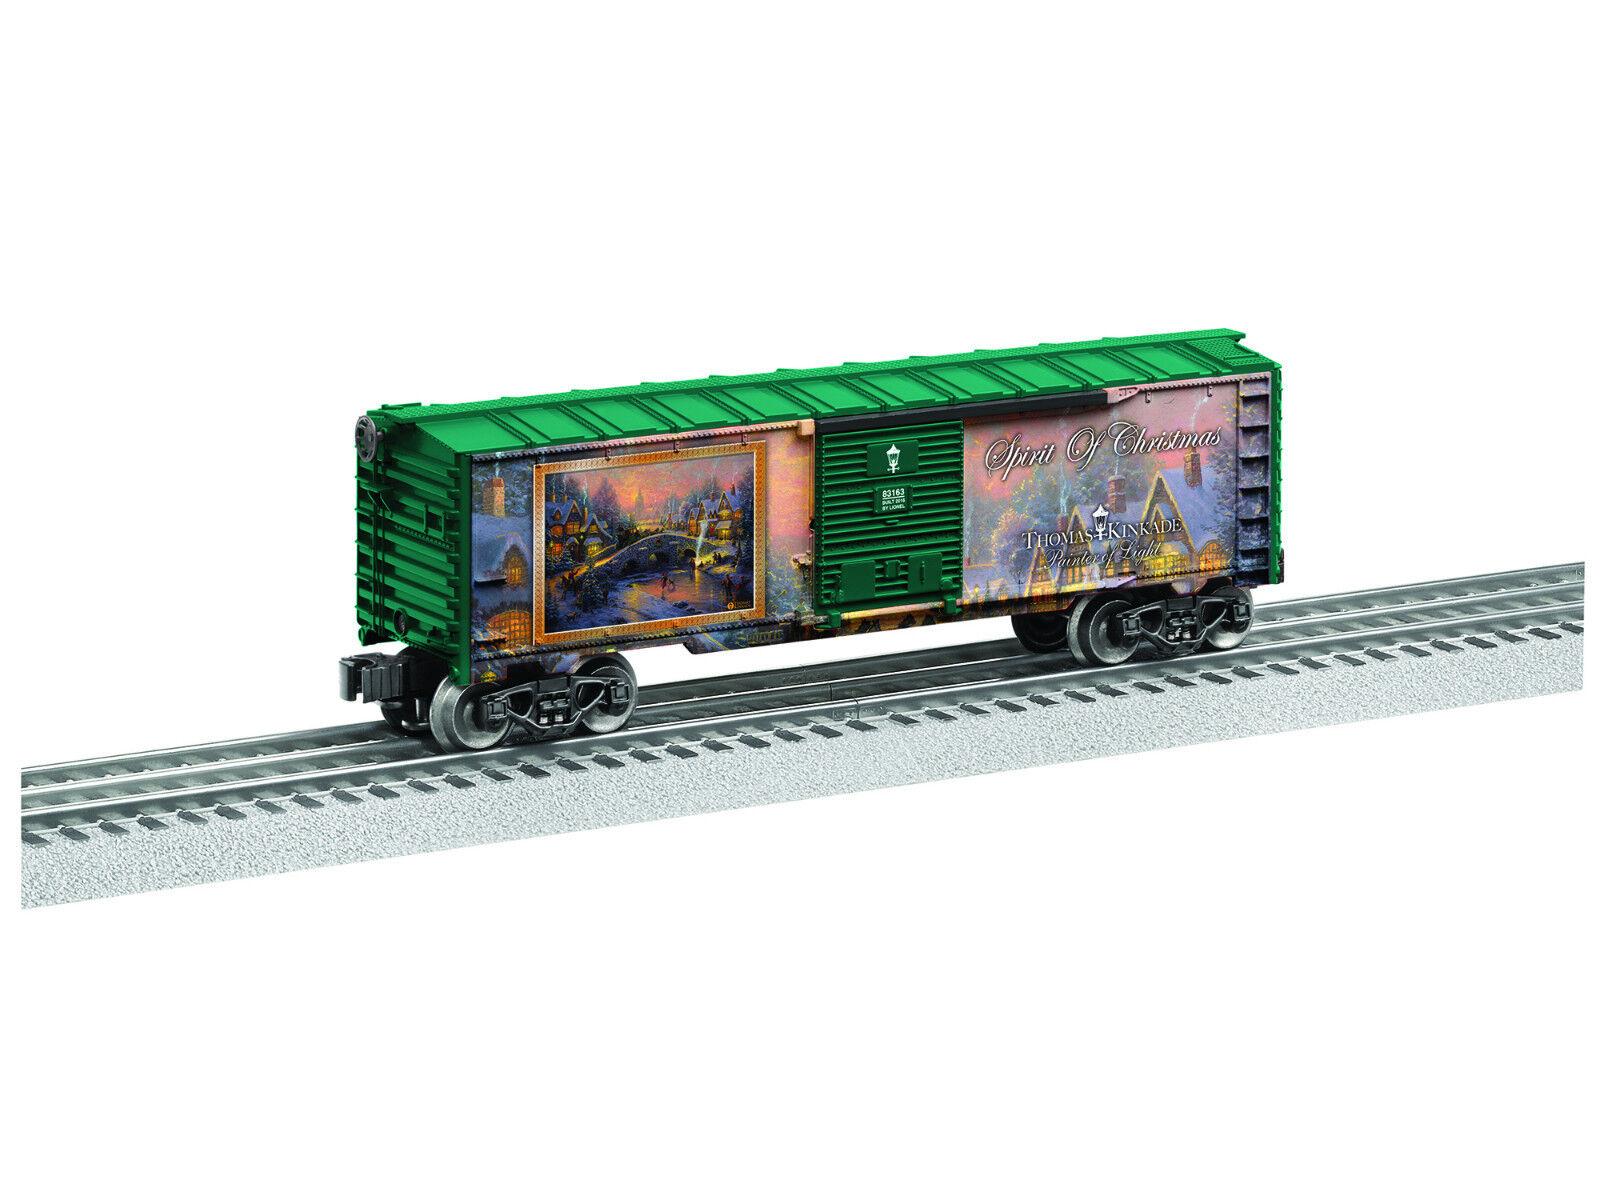 Lionel 6-83163 O Kinkade Christmas Boxcar NEW IN ORIGINAL BOX